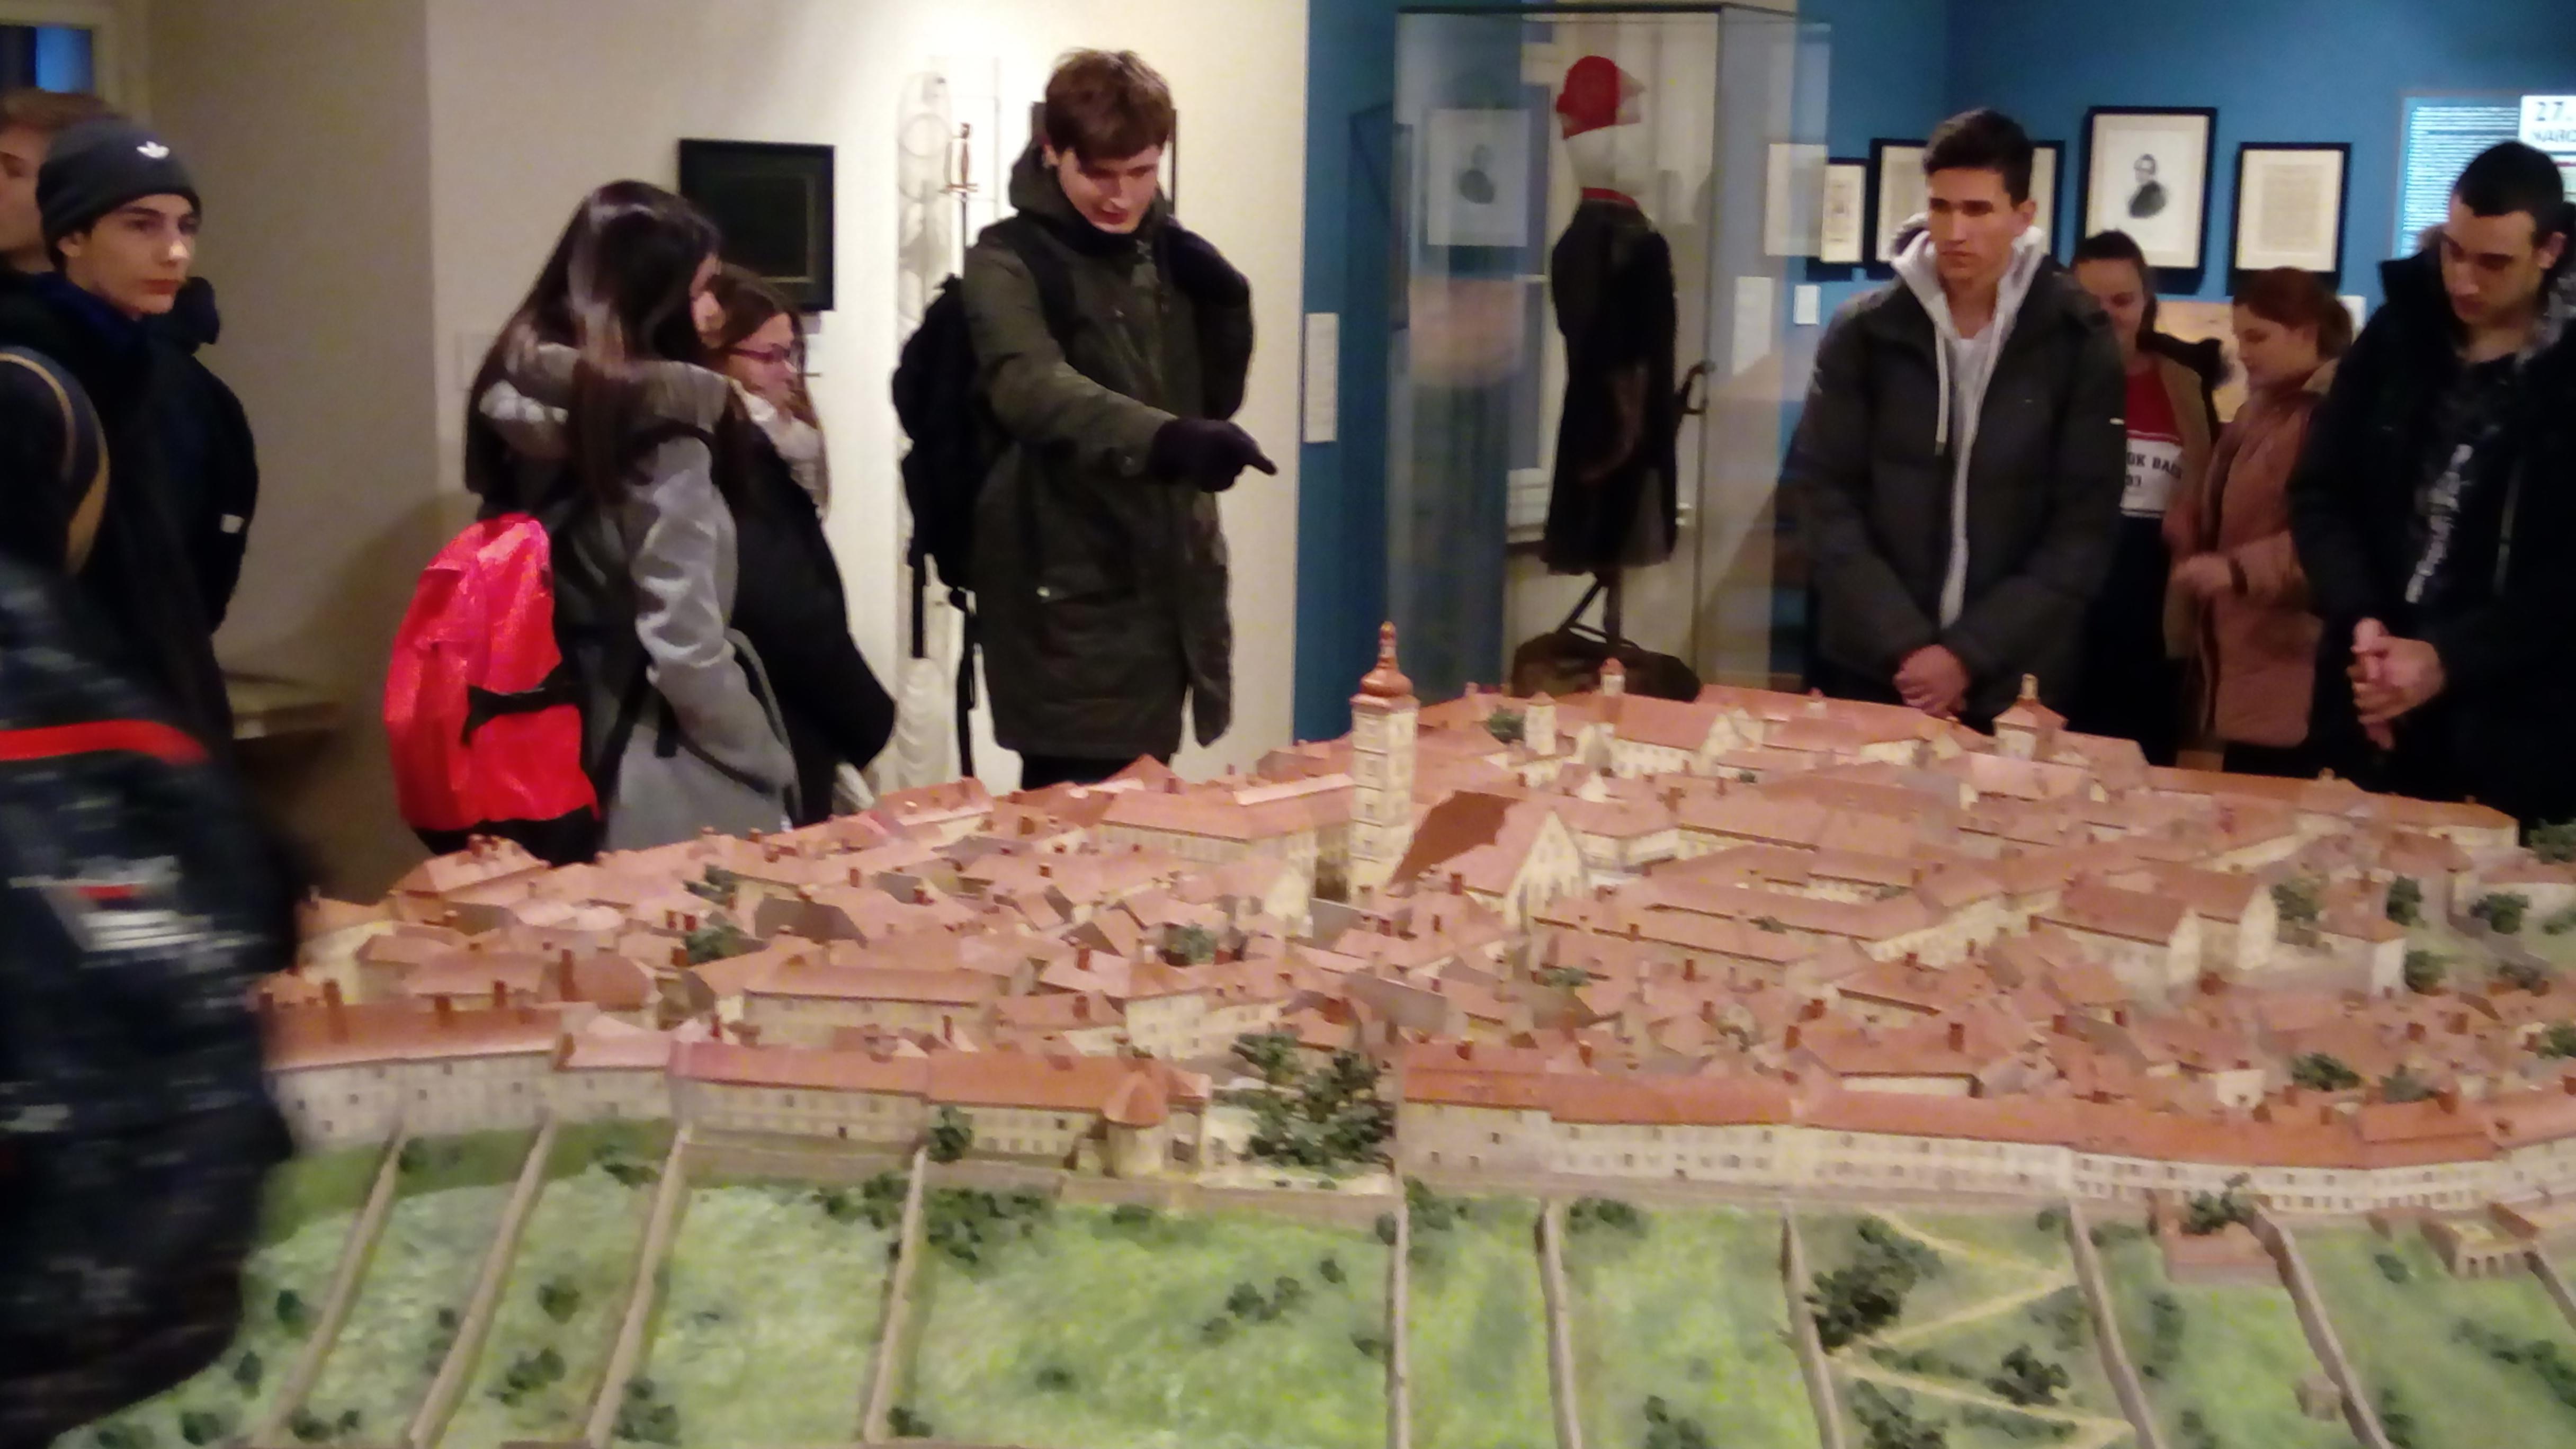 Posjet Muzeju grada Zagreba